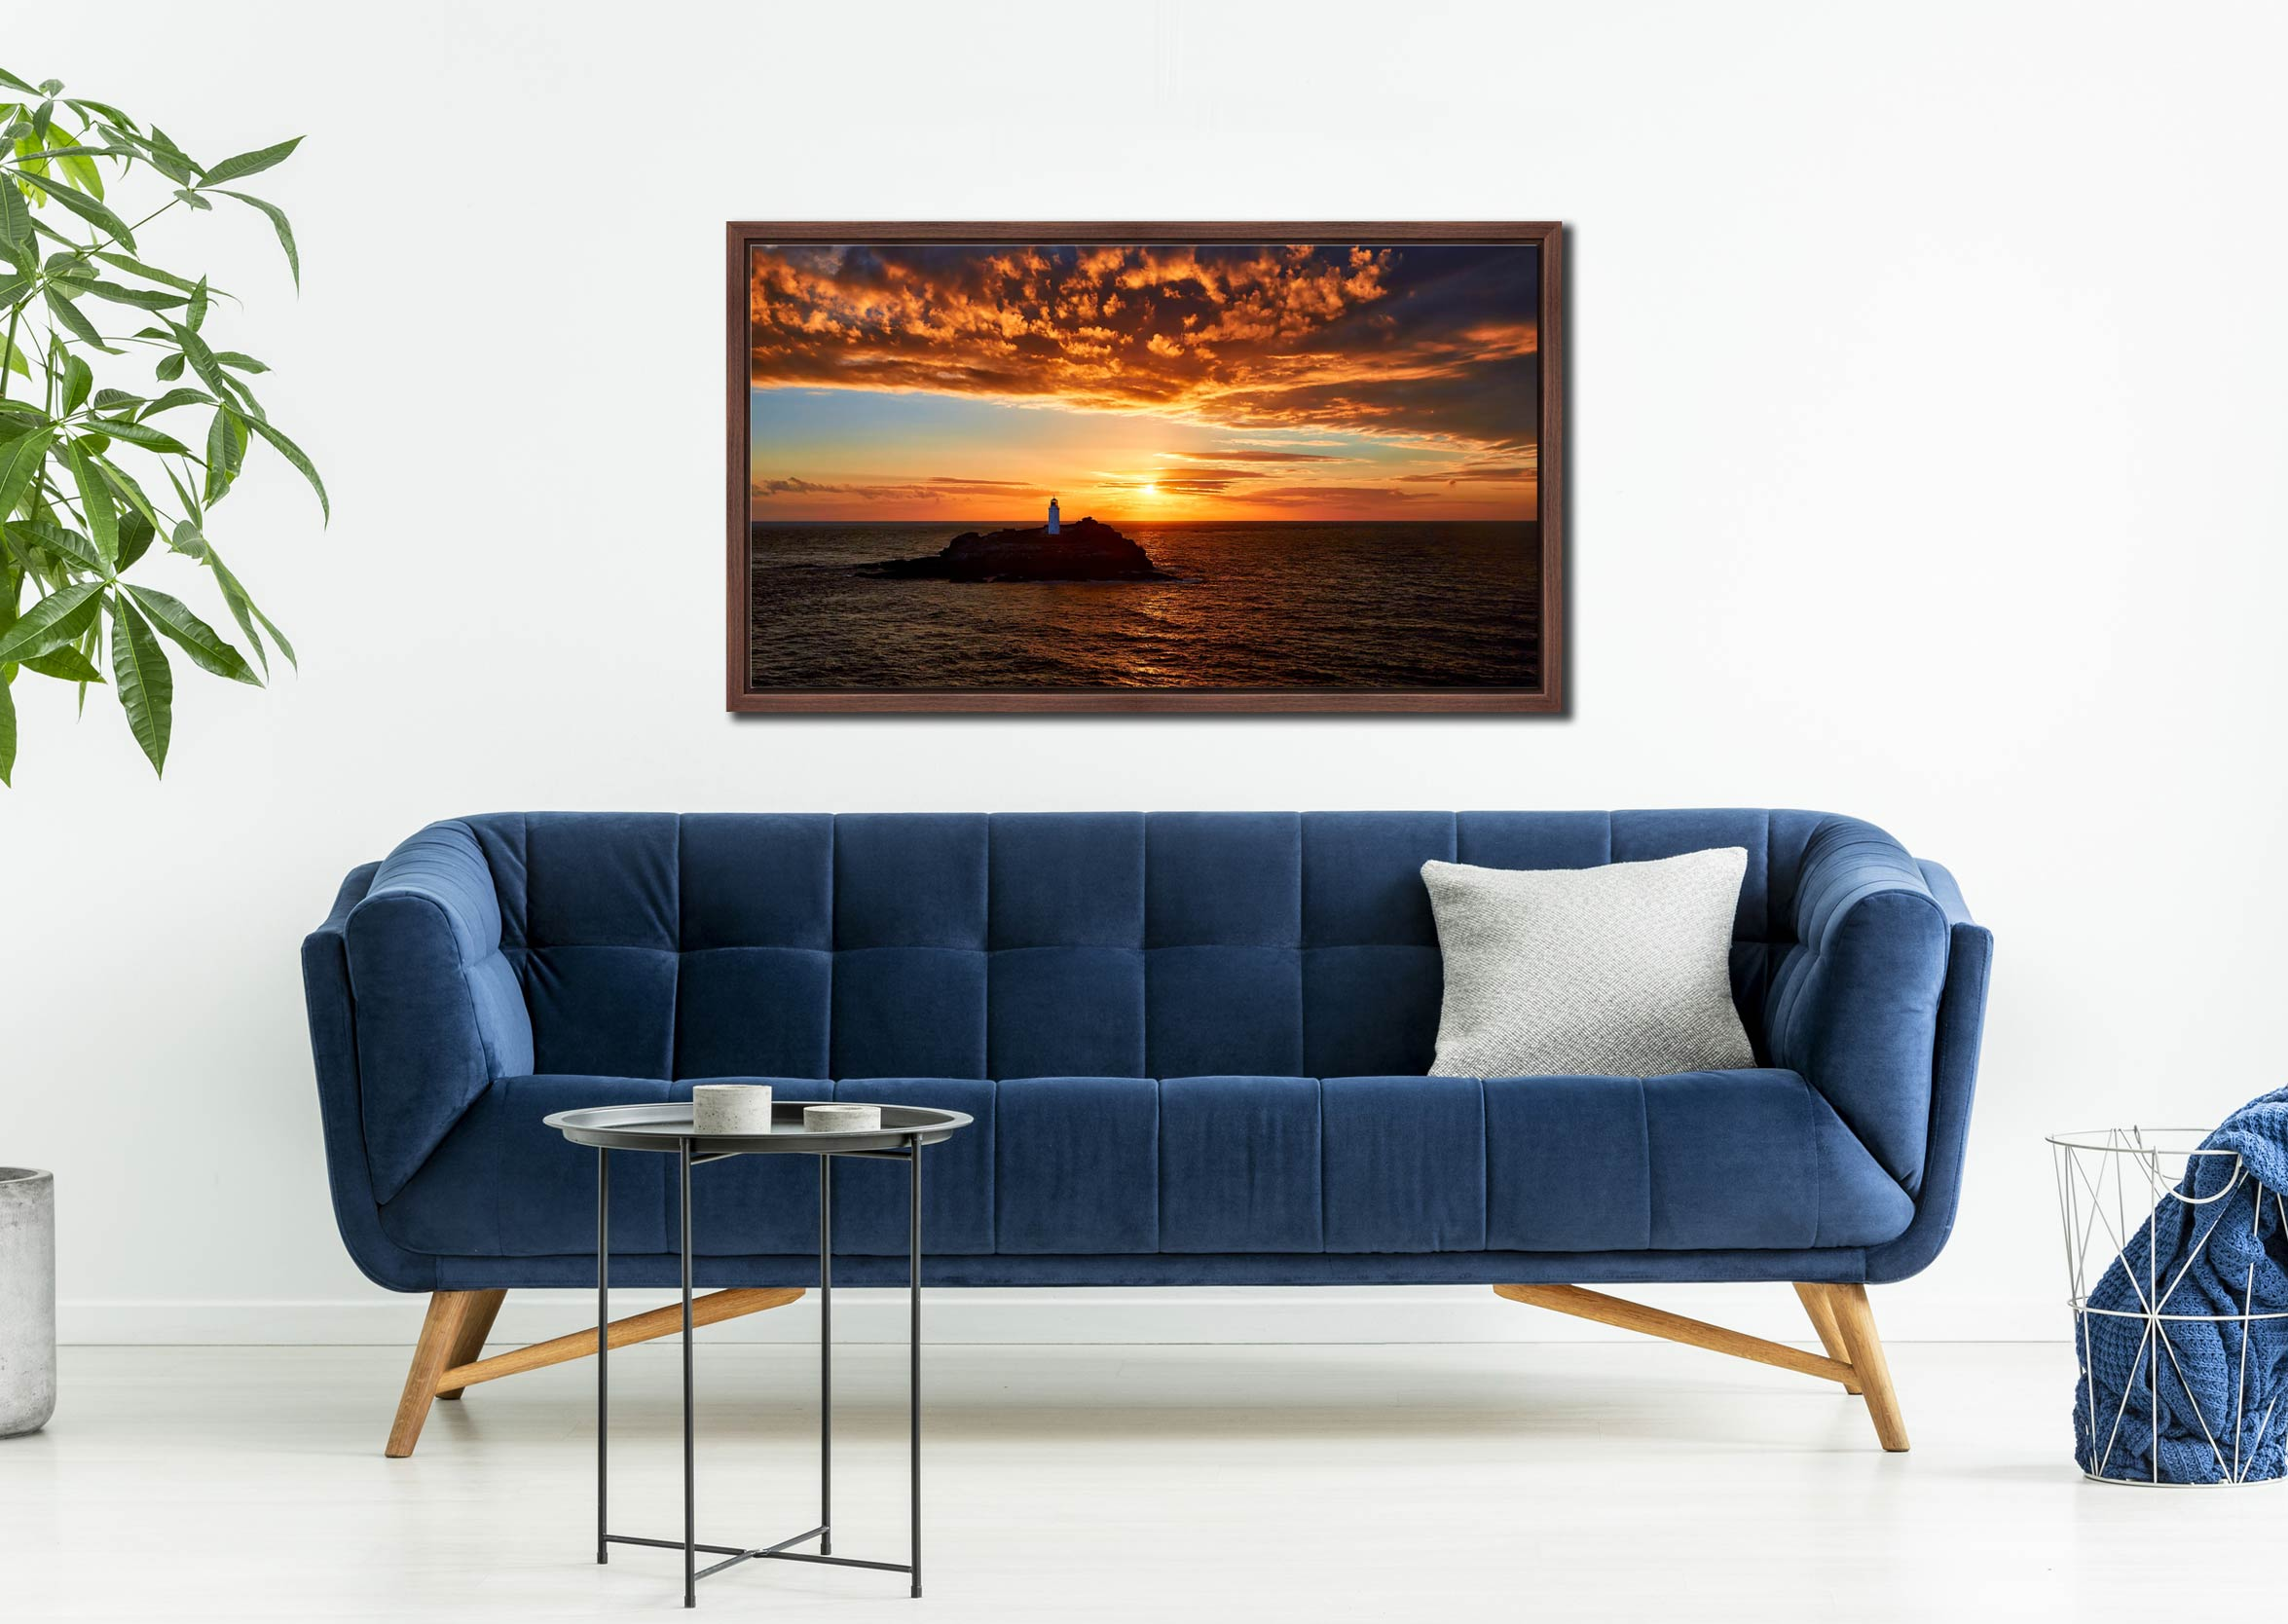 Sunset Over Godrevy Lighthouse - Walnut floater frame with acrylic glazing on Wall